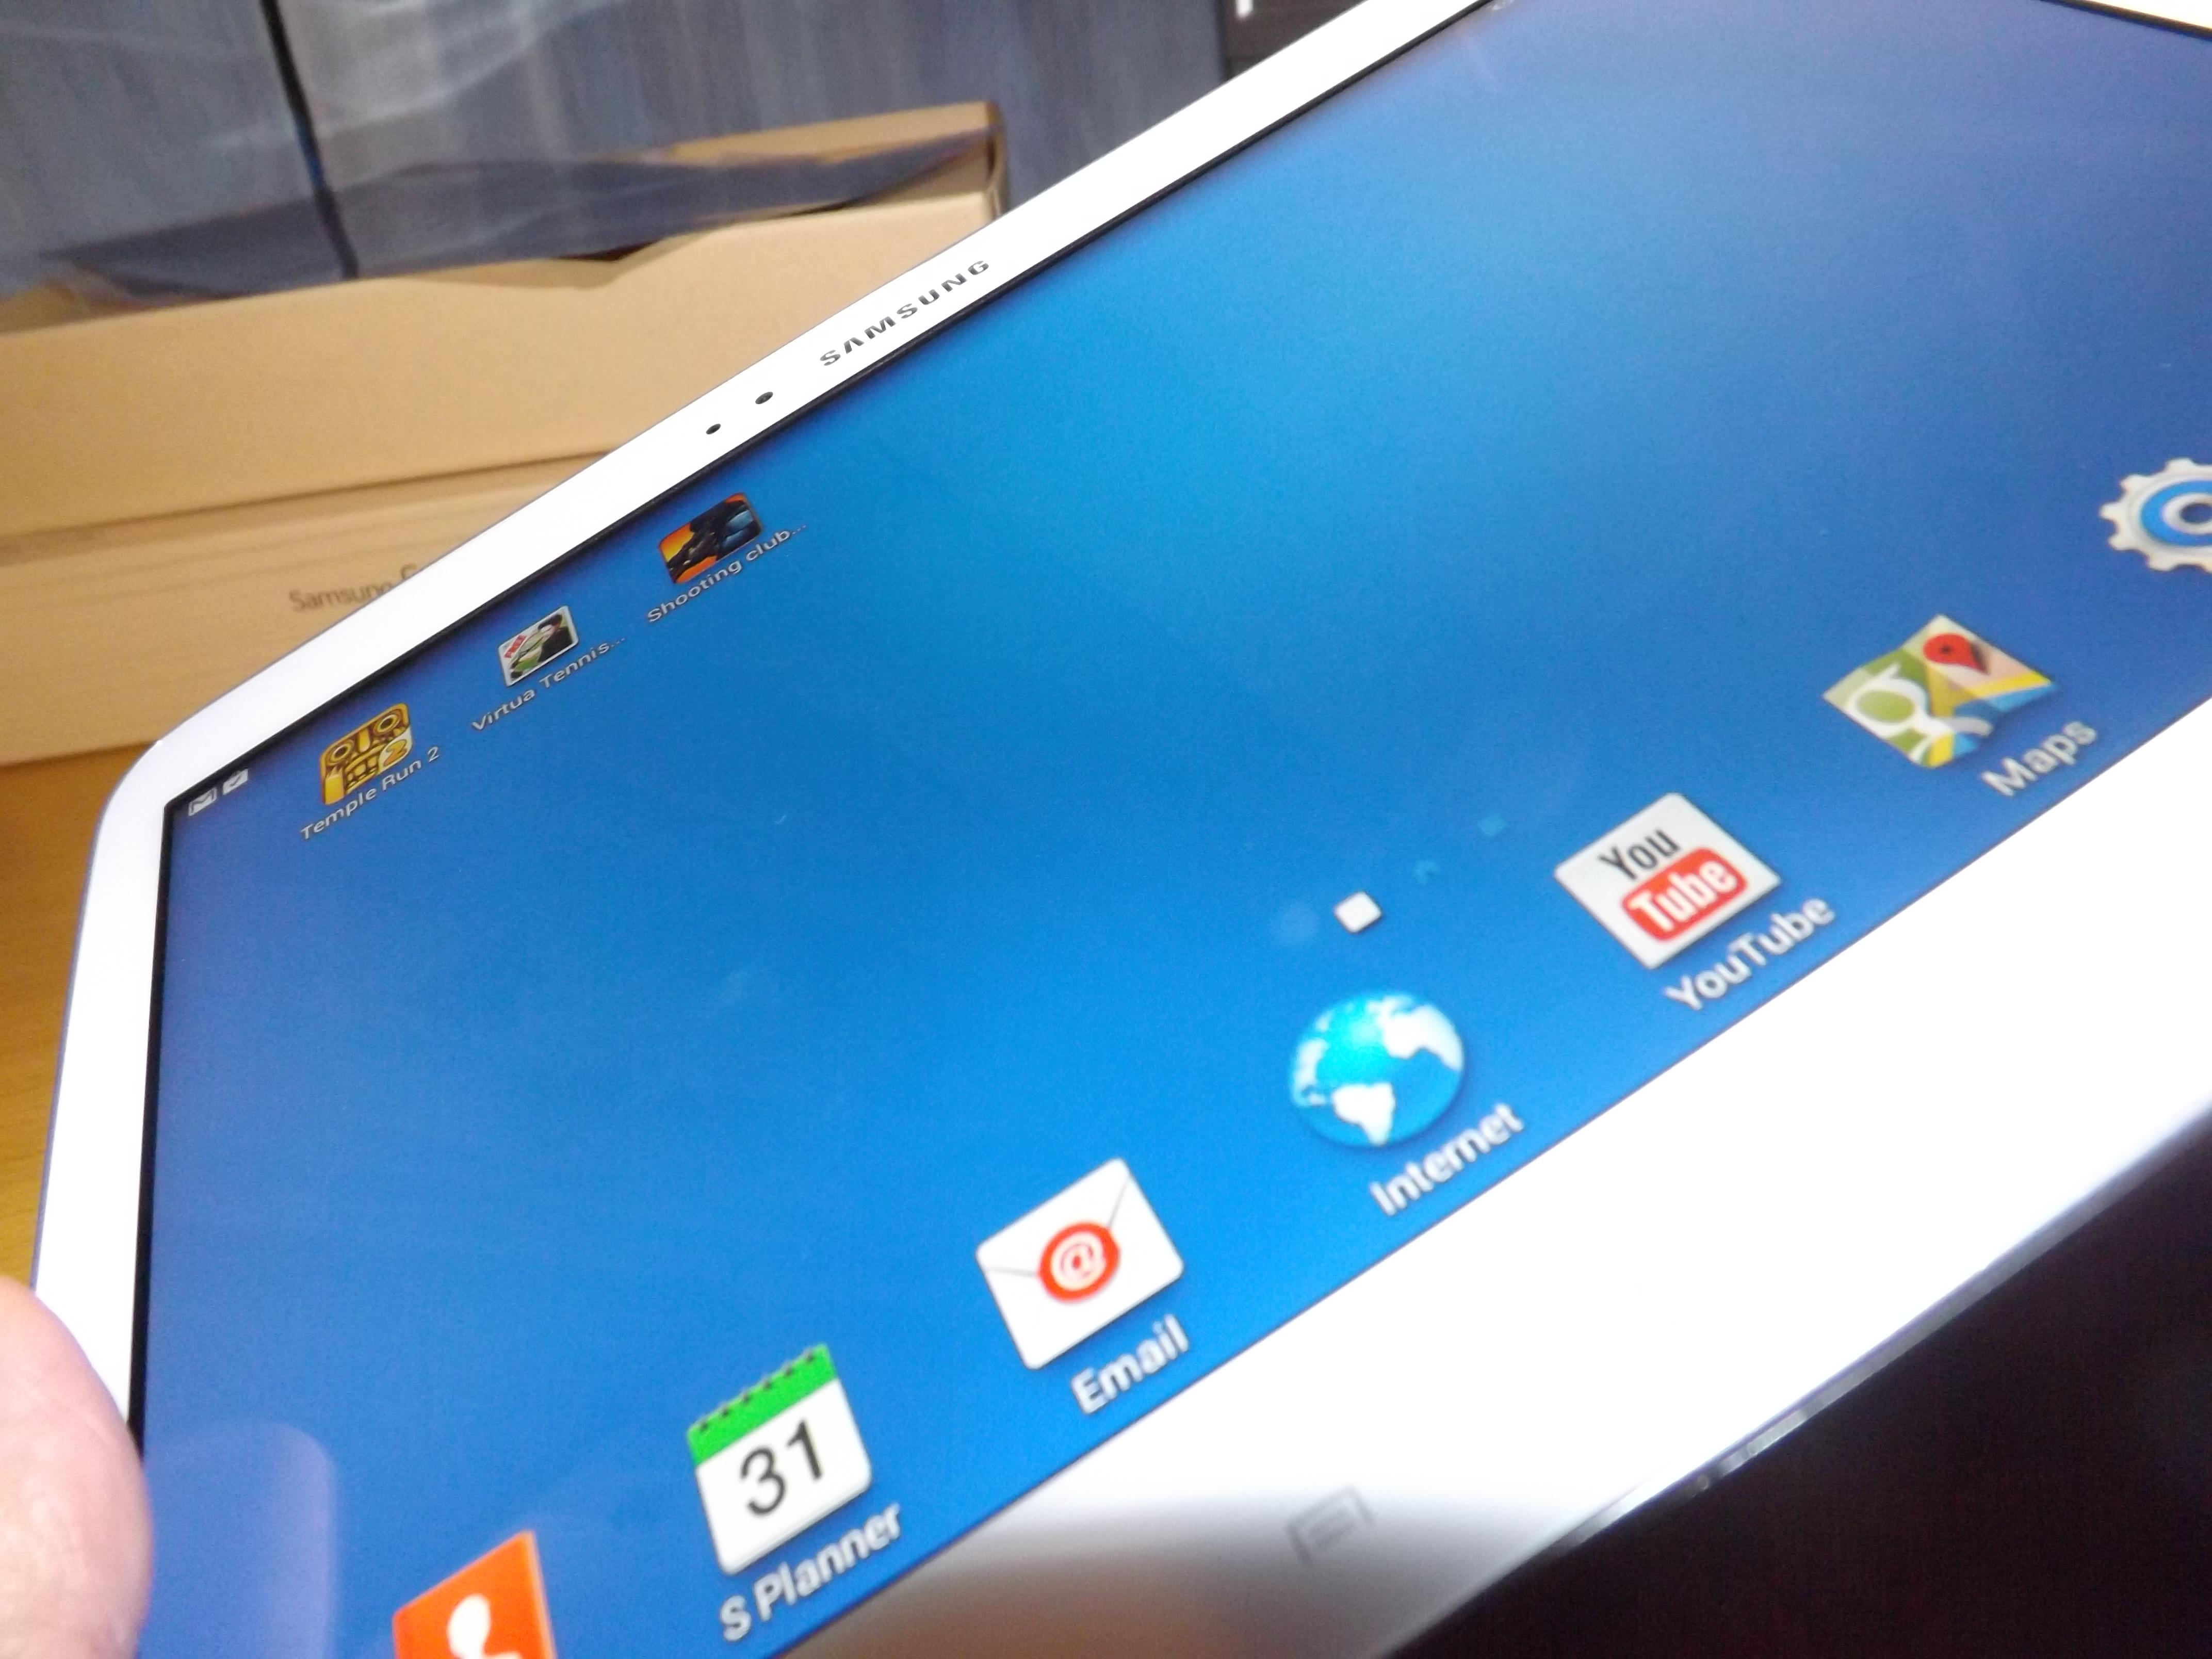 Samsung Galaxy Tab 3 P5210 frontal